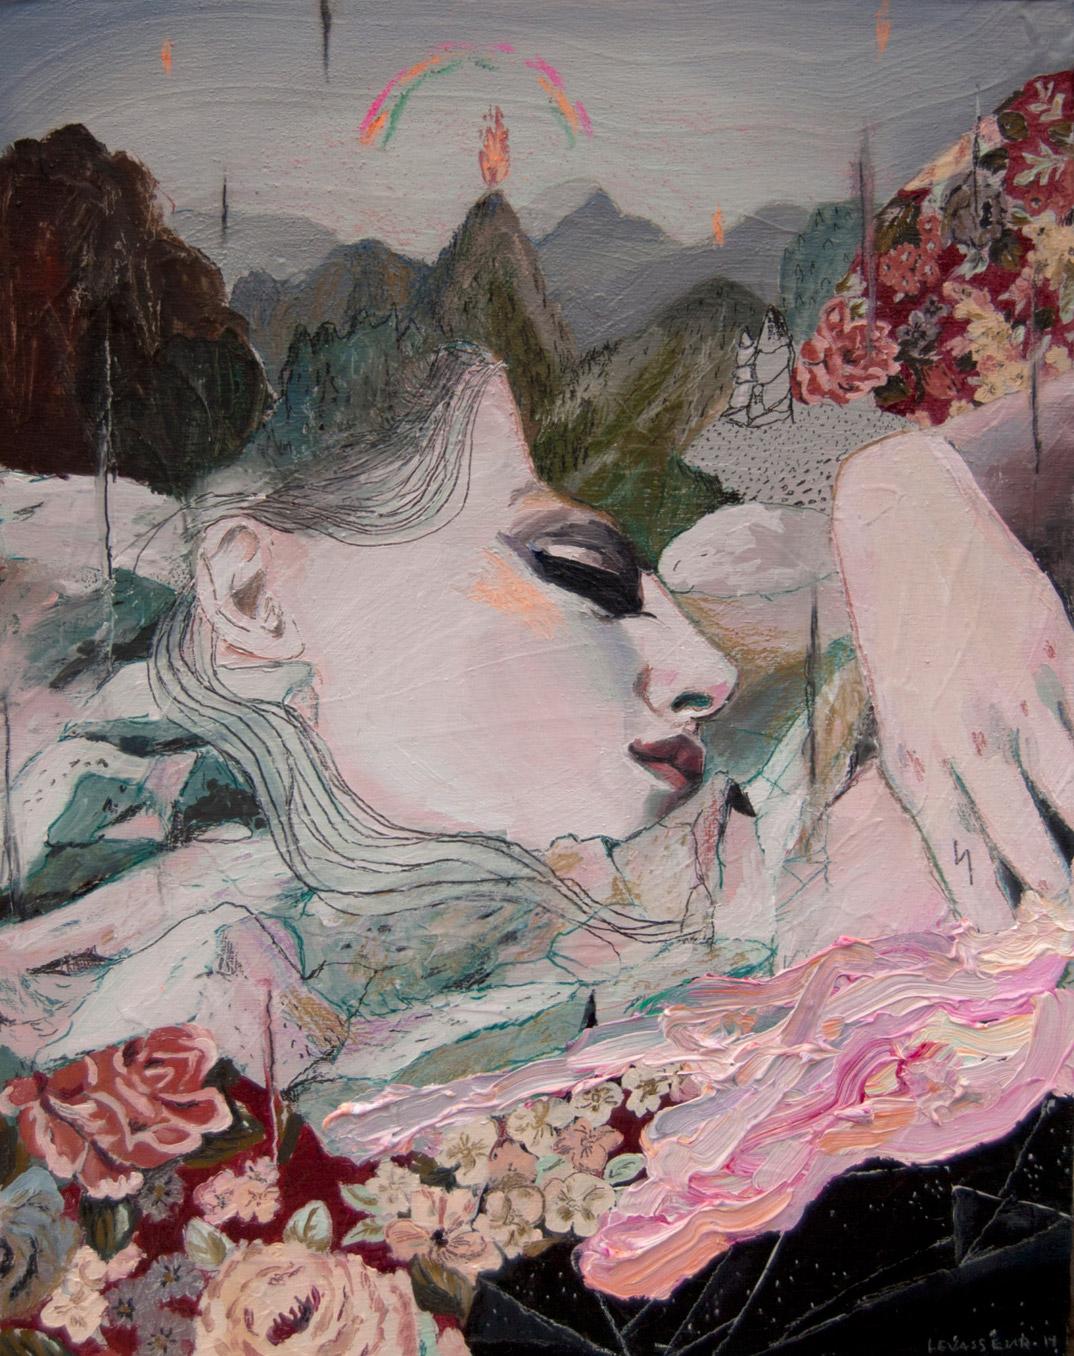 dipinyi-surreali-donne-alexandra-levasseur-05